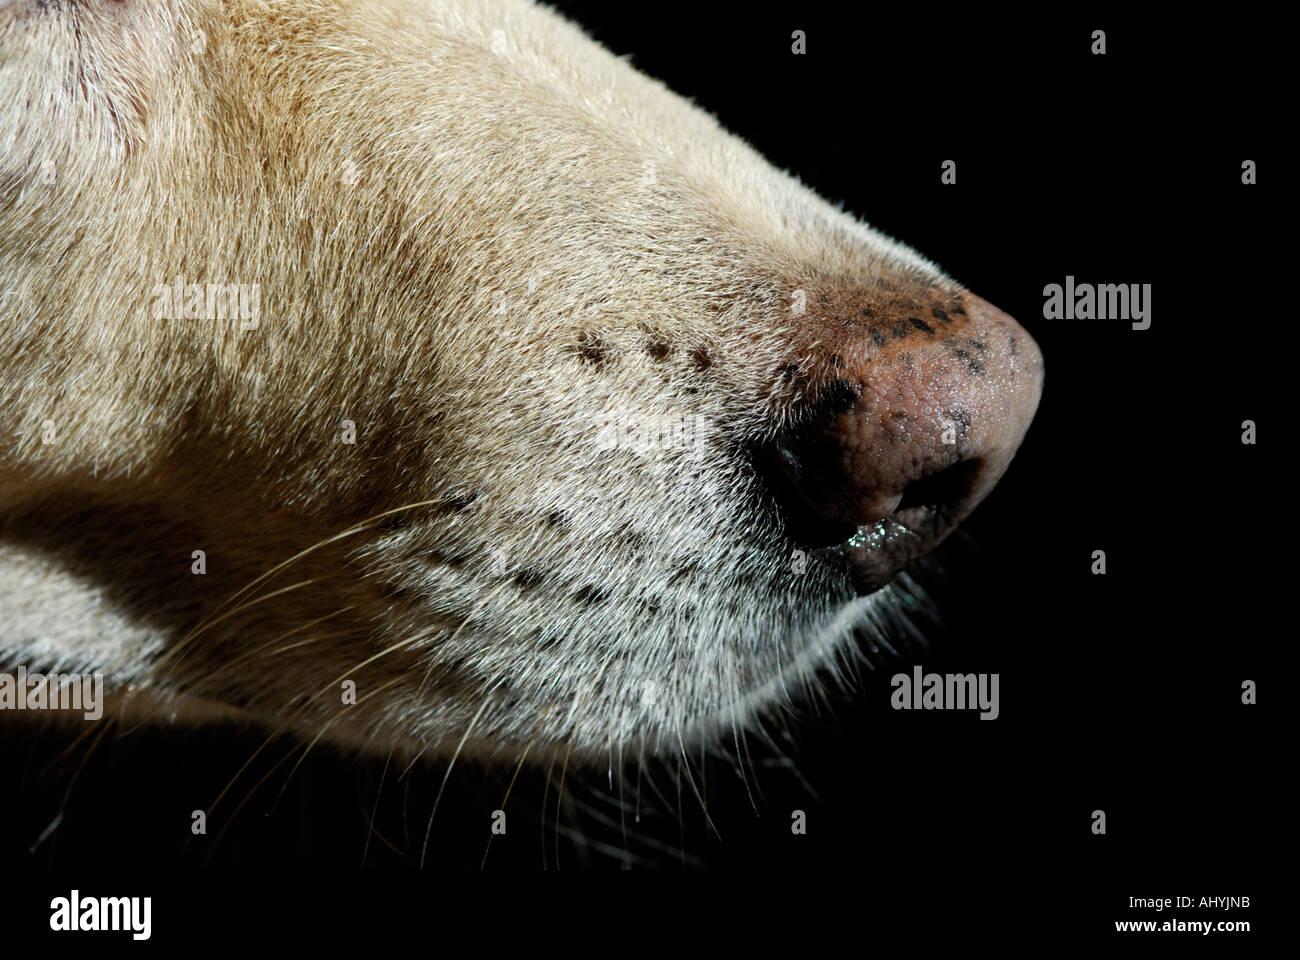 Dog's nose close-up - Stock Image